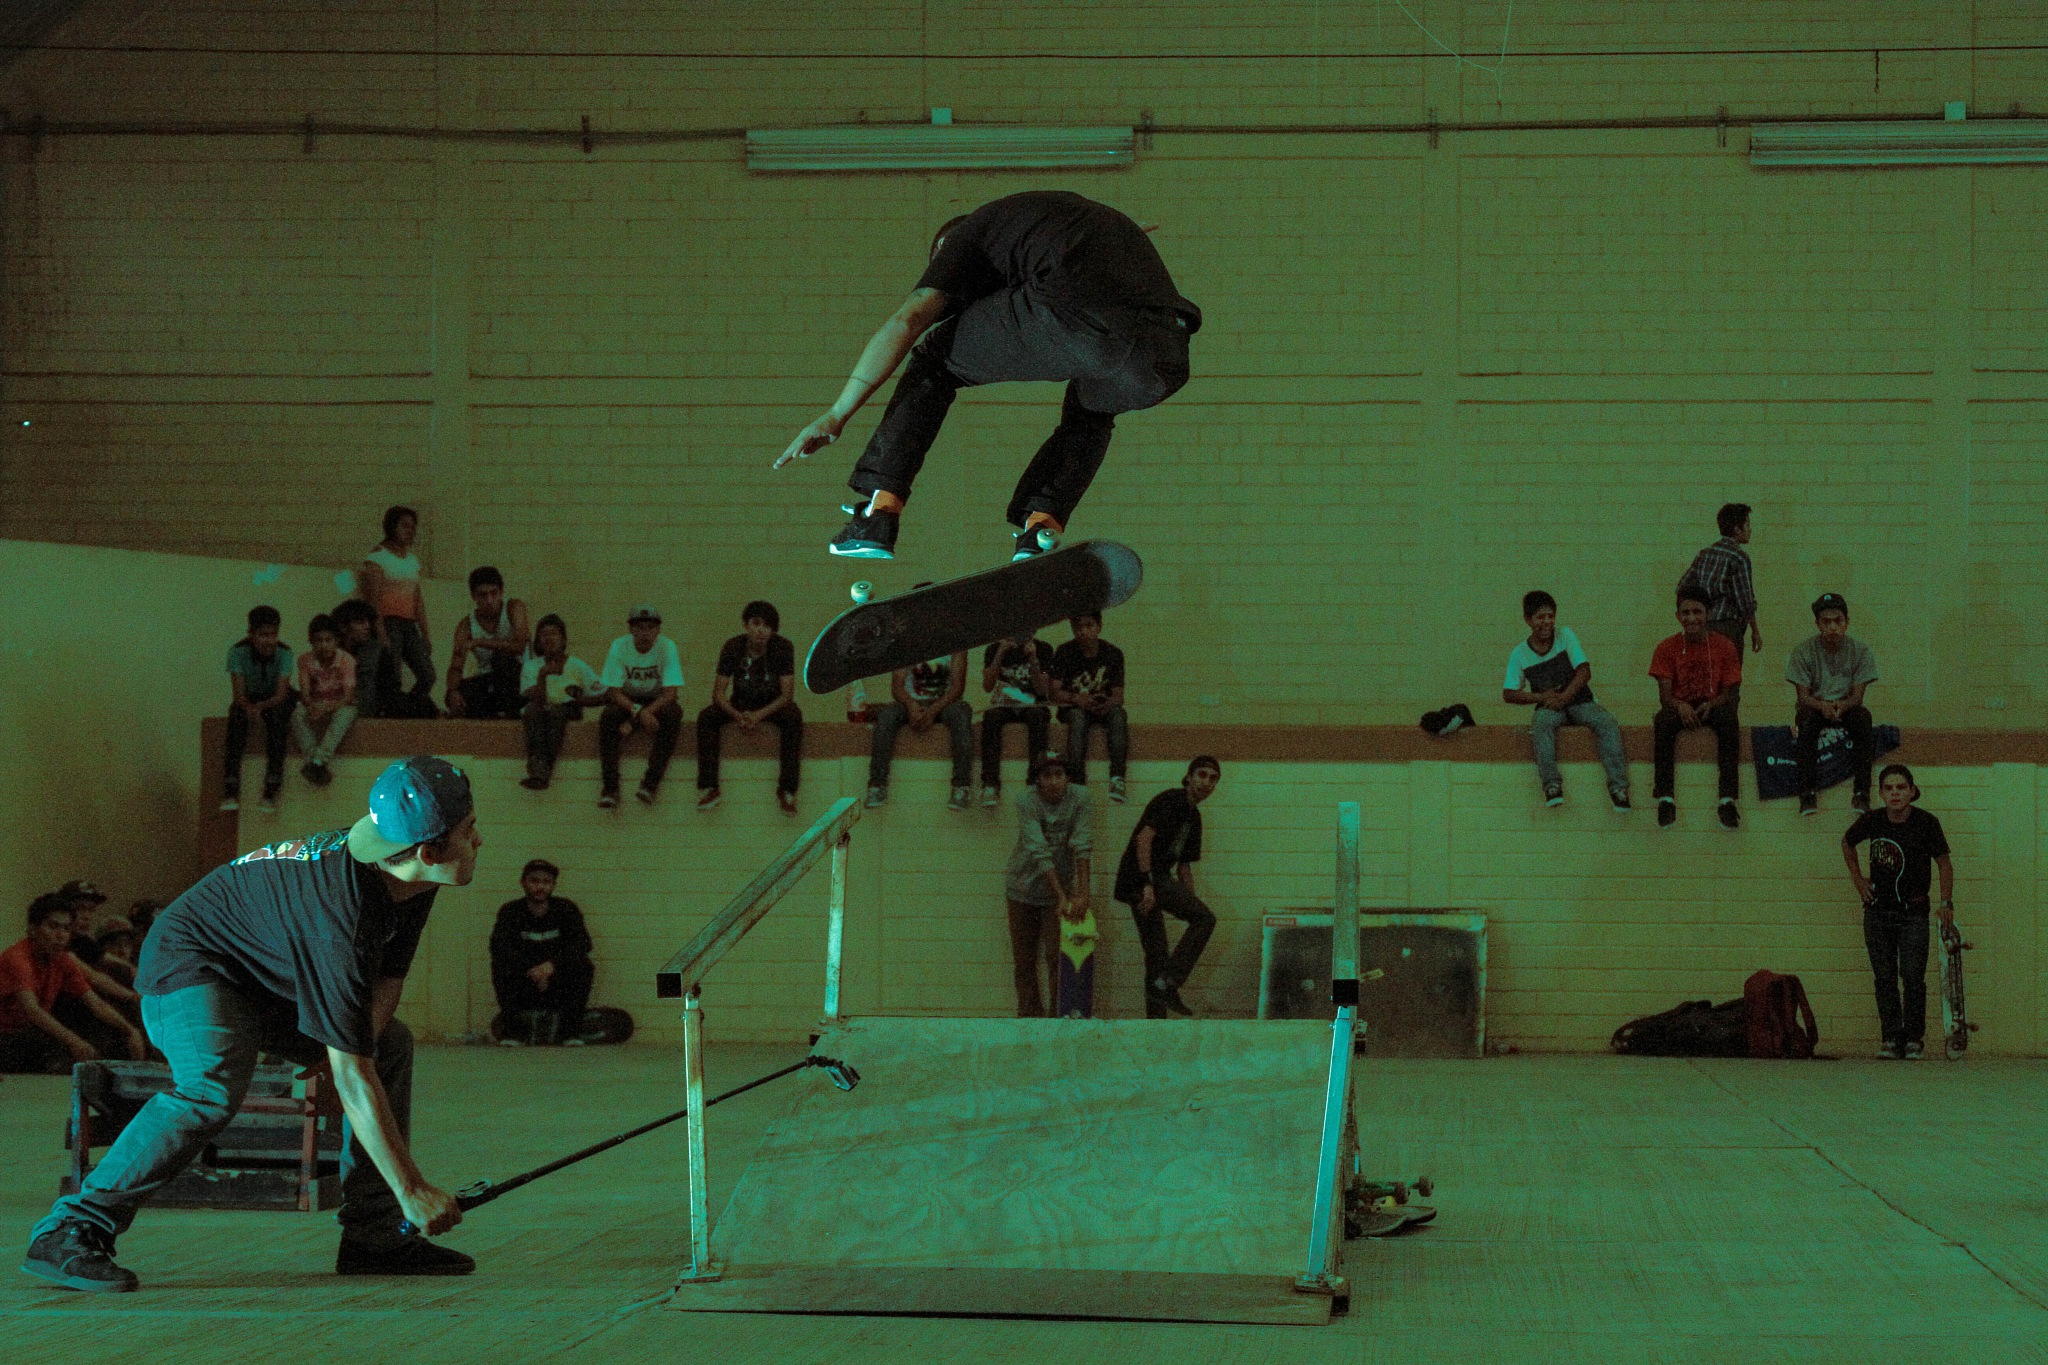 skateboarding by osvaldo medina xolaltenco